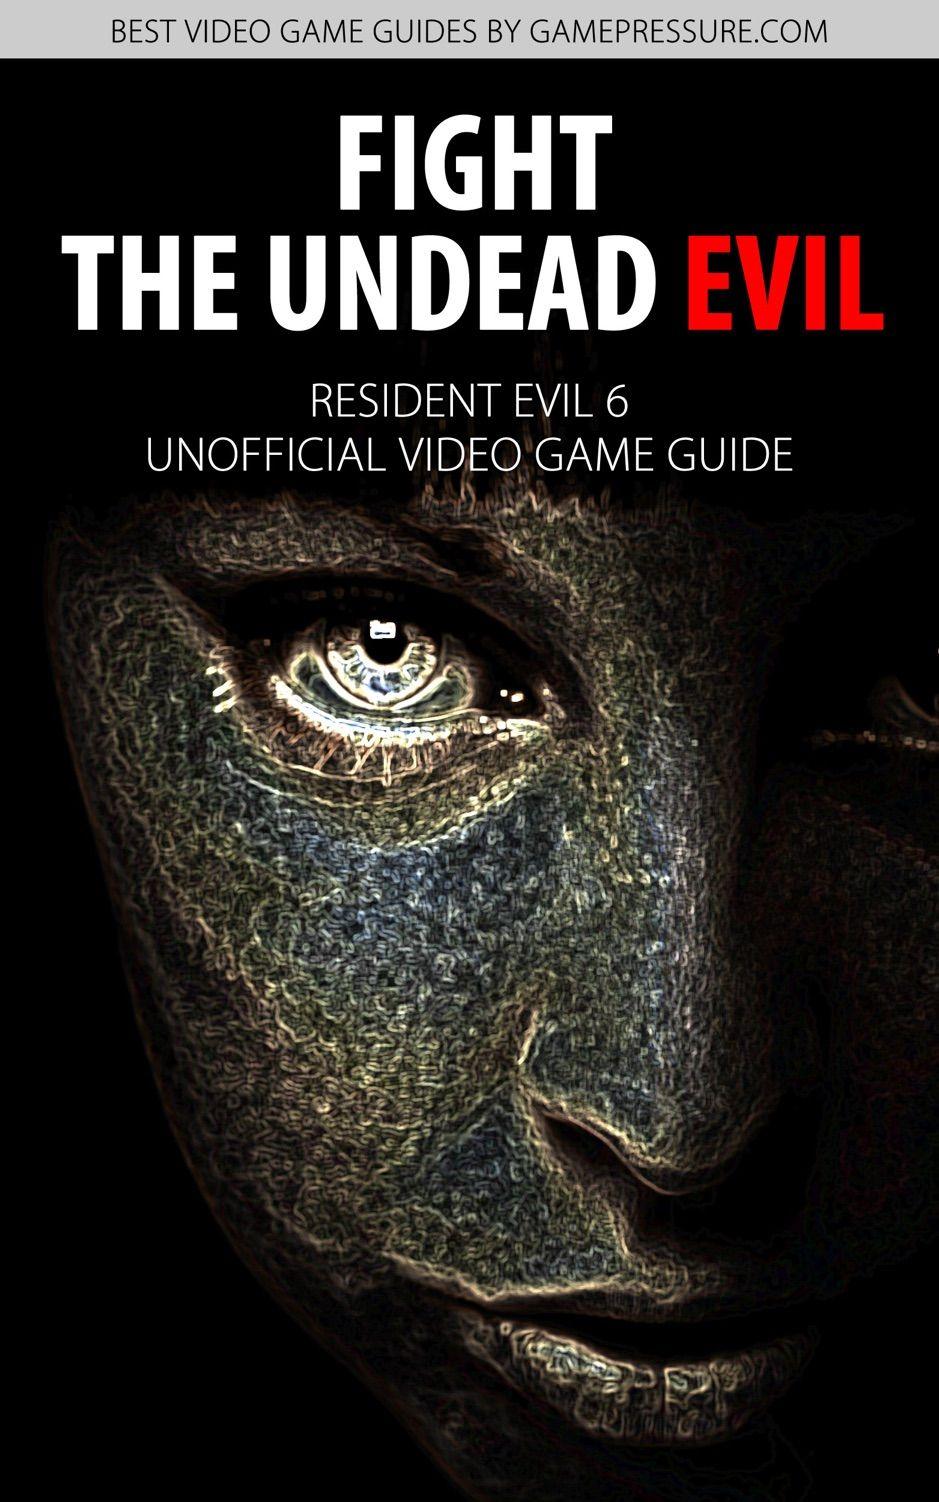 Fight the Undead Evil Resident Evil 6 , Ad, Evil